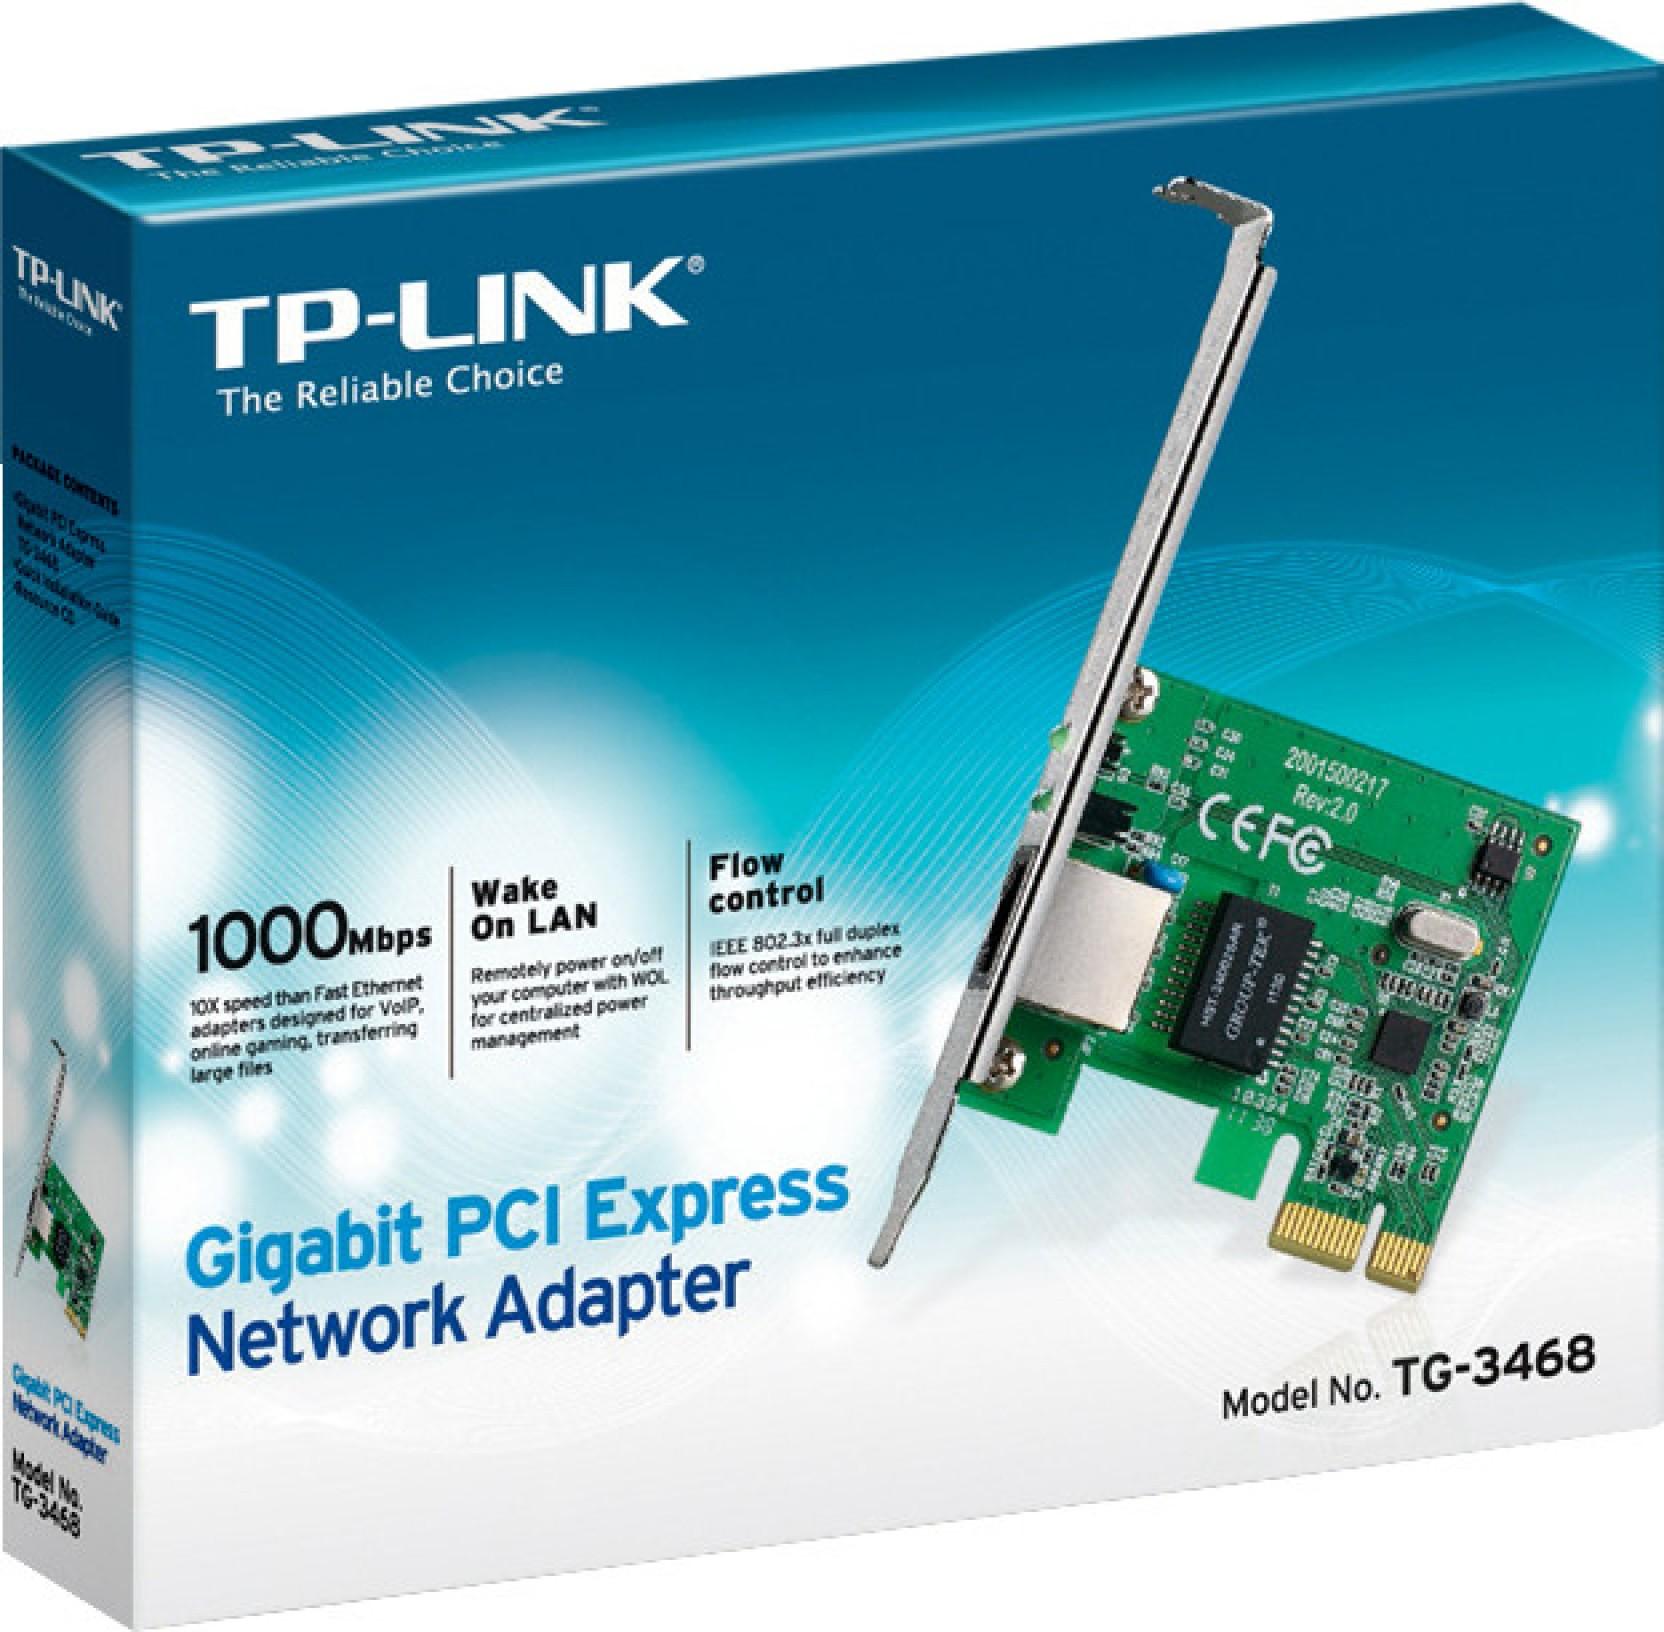 TP-LINK TG-3468 Gigabit PCIe Network Adapter Nic